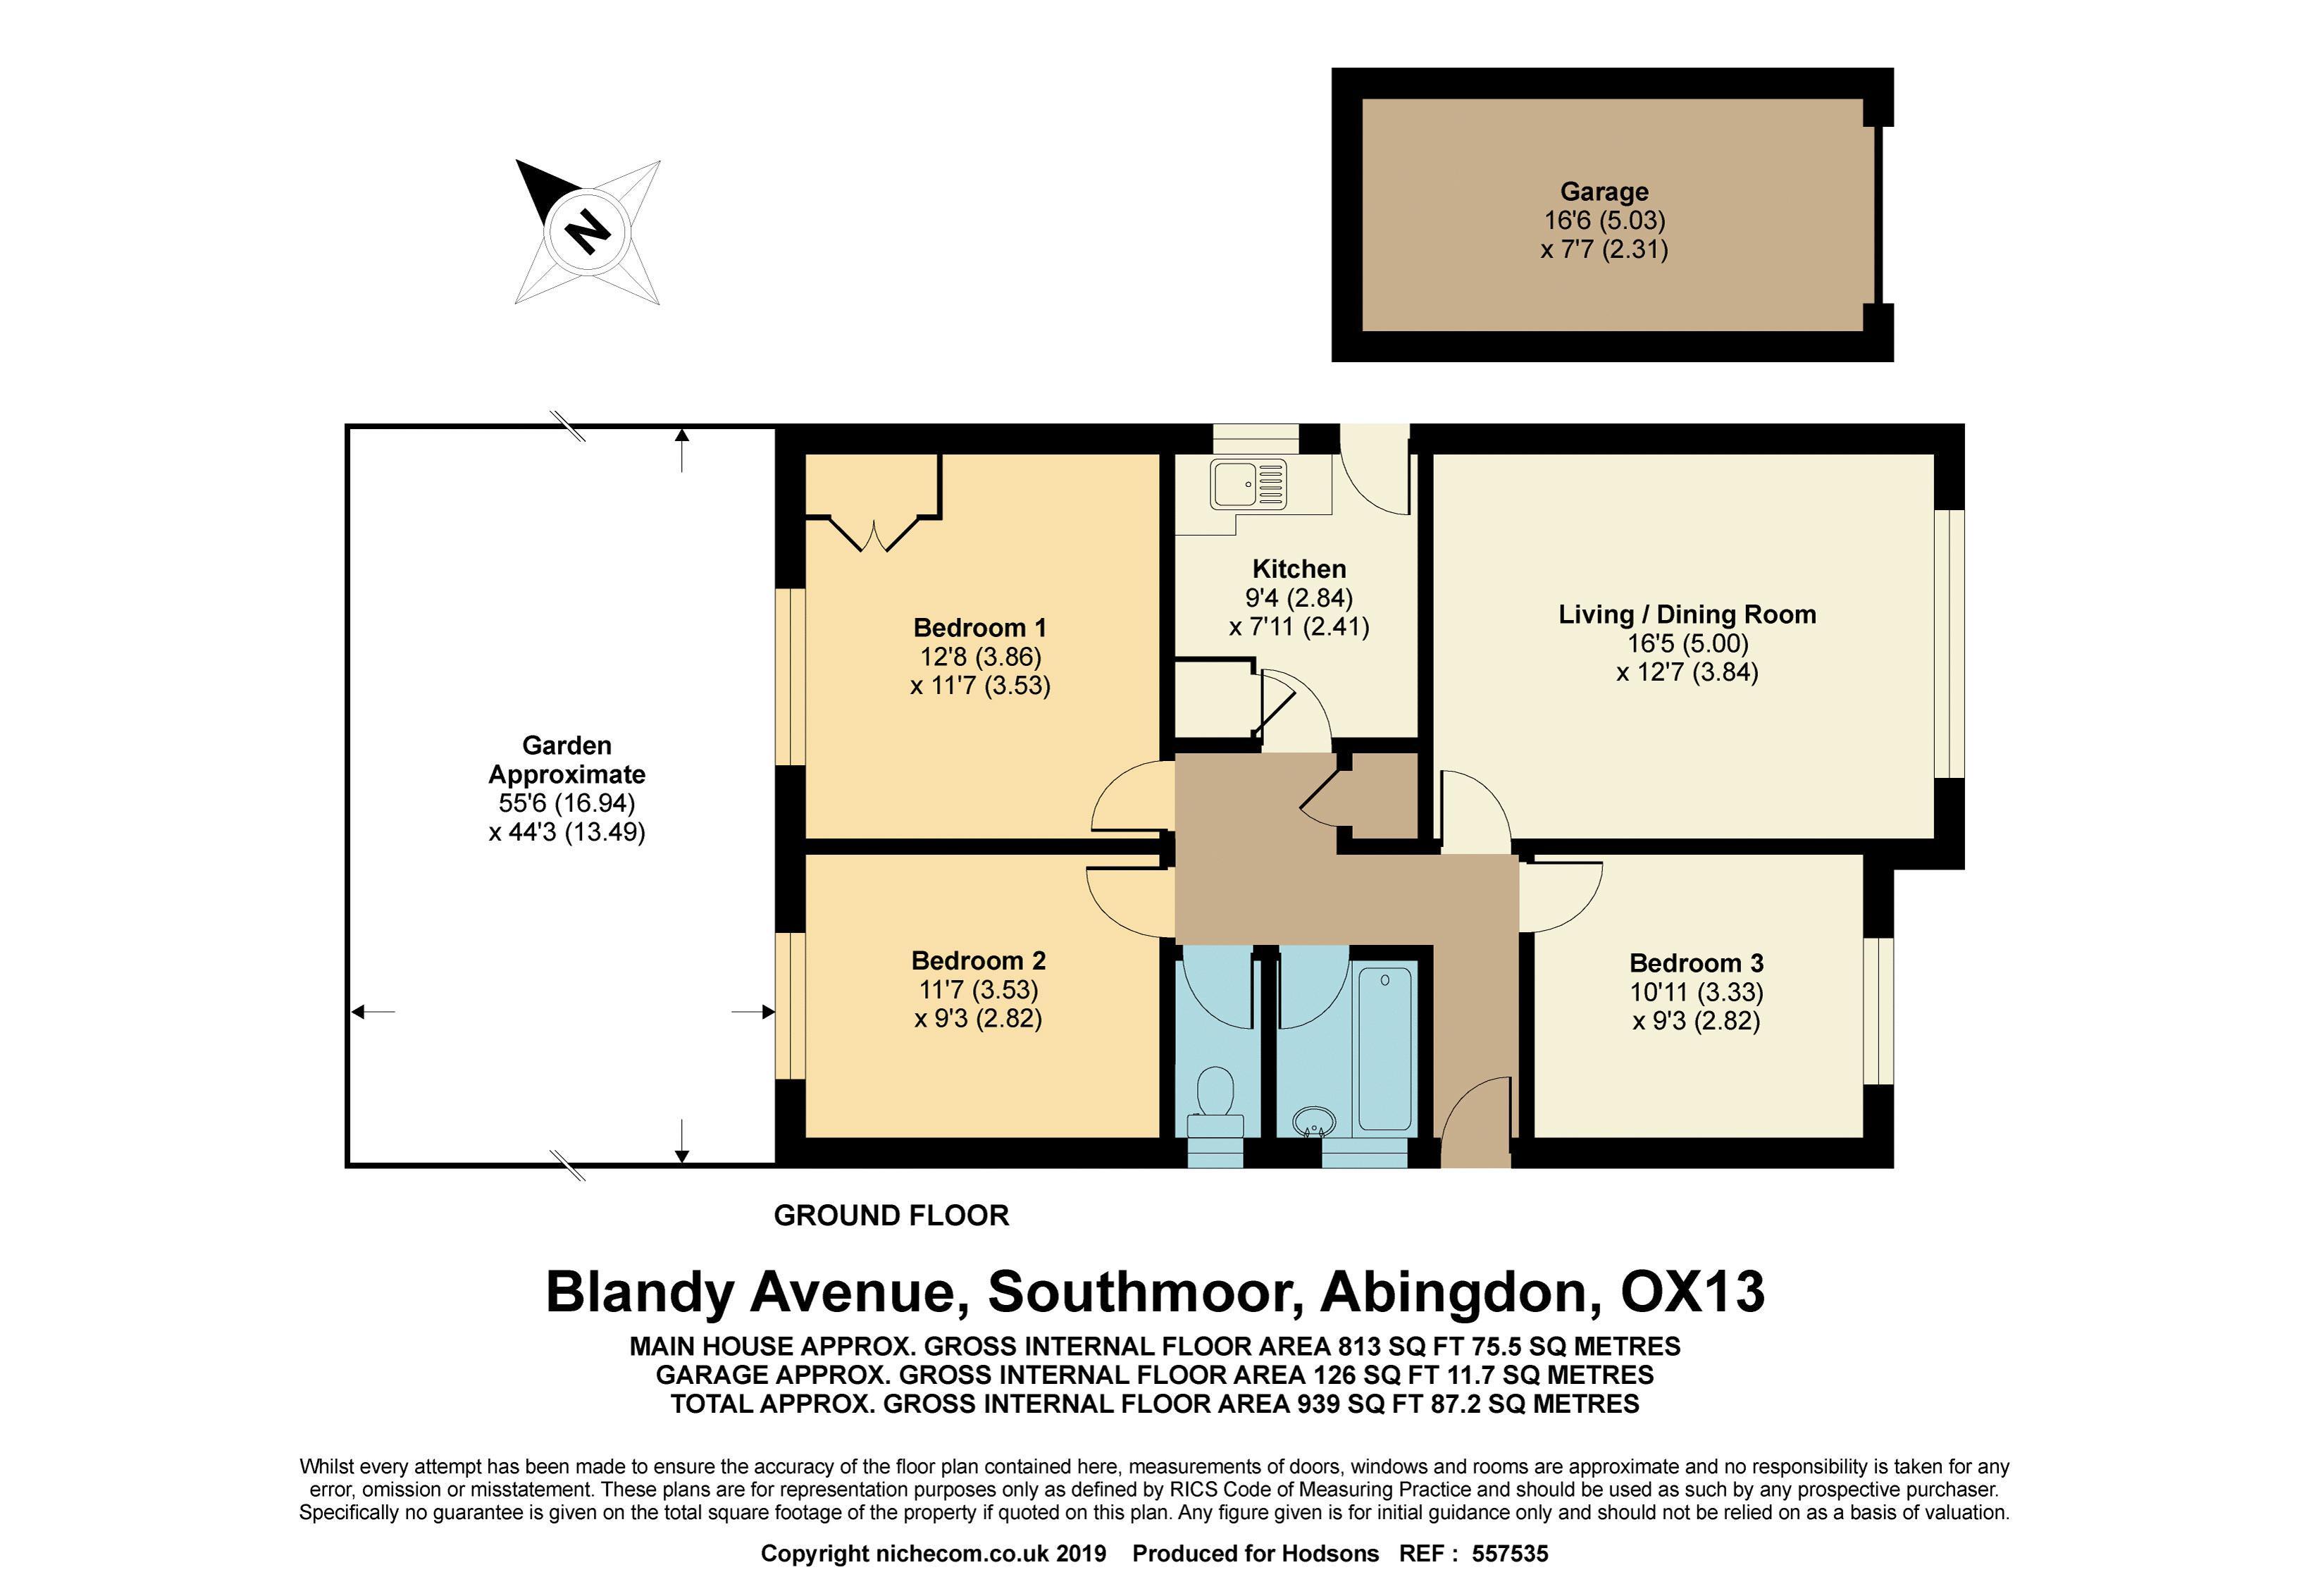 Blandy Avenue Southmoor